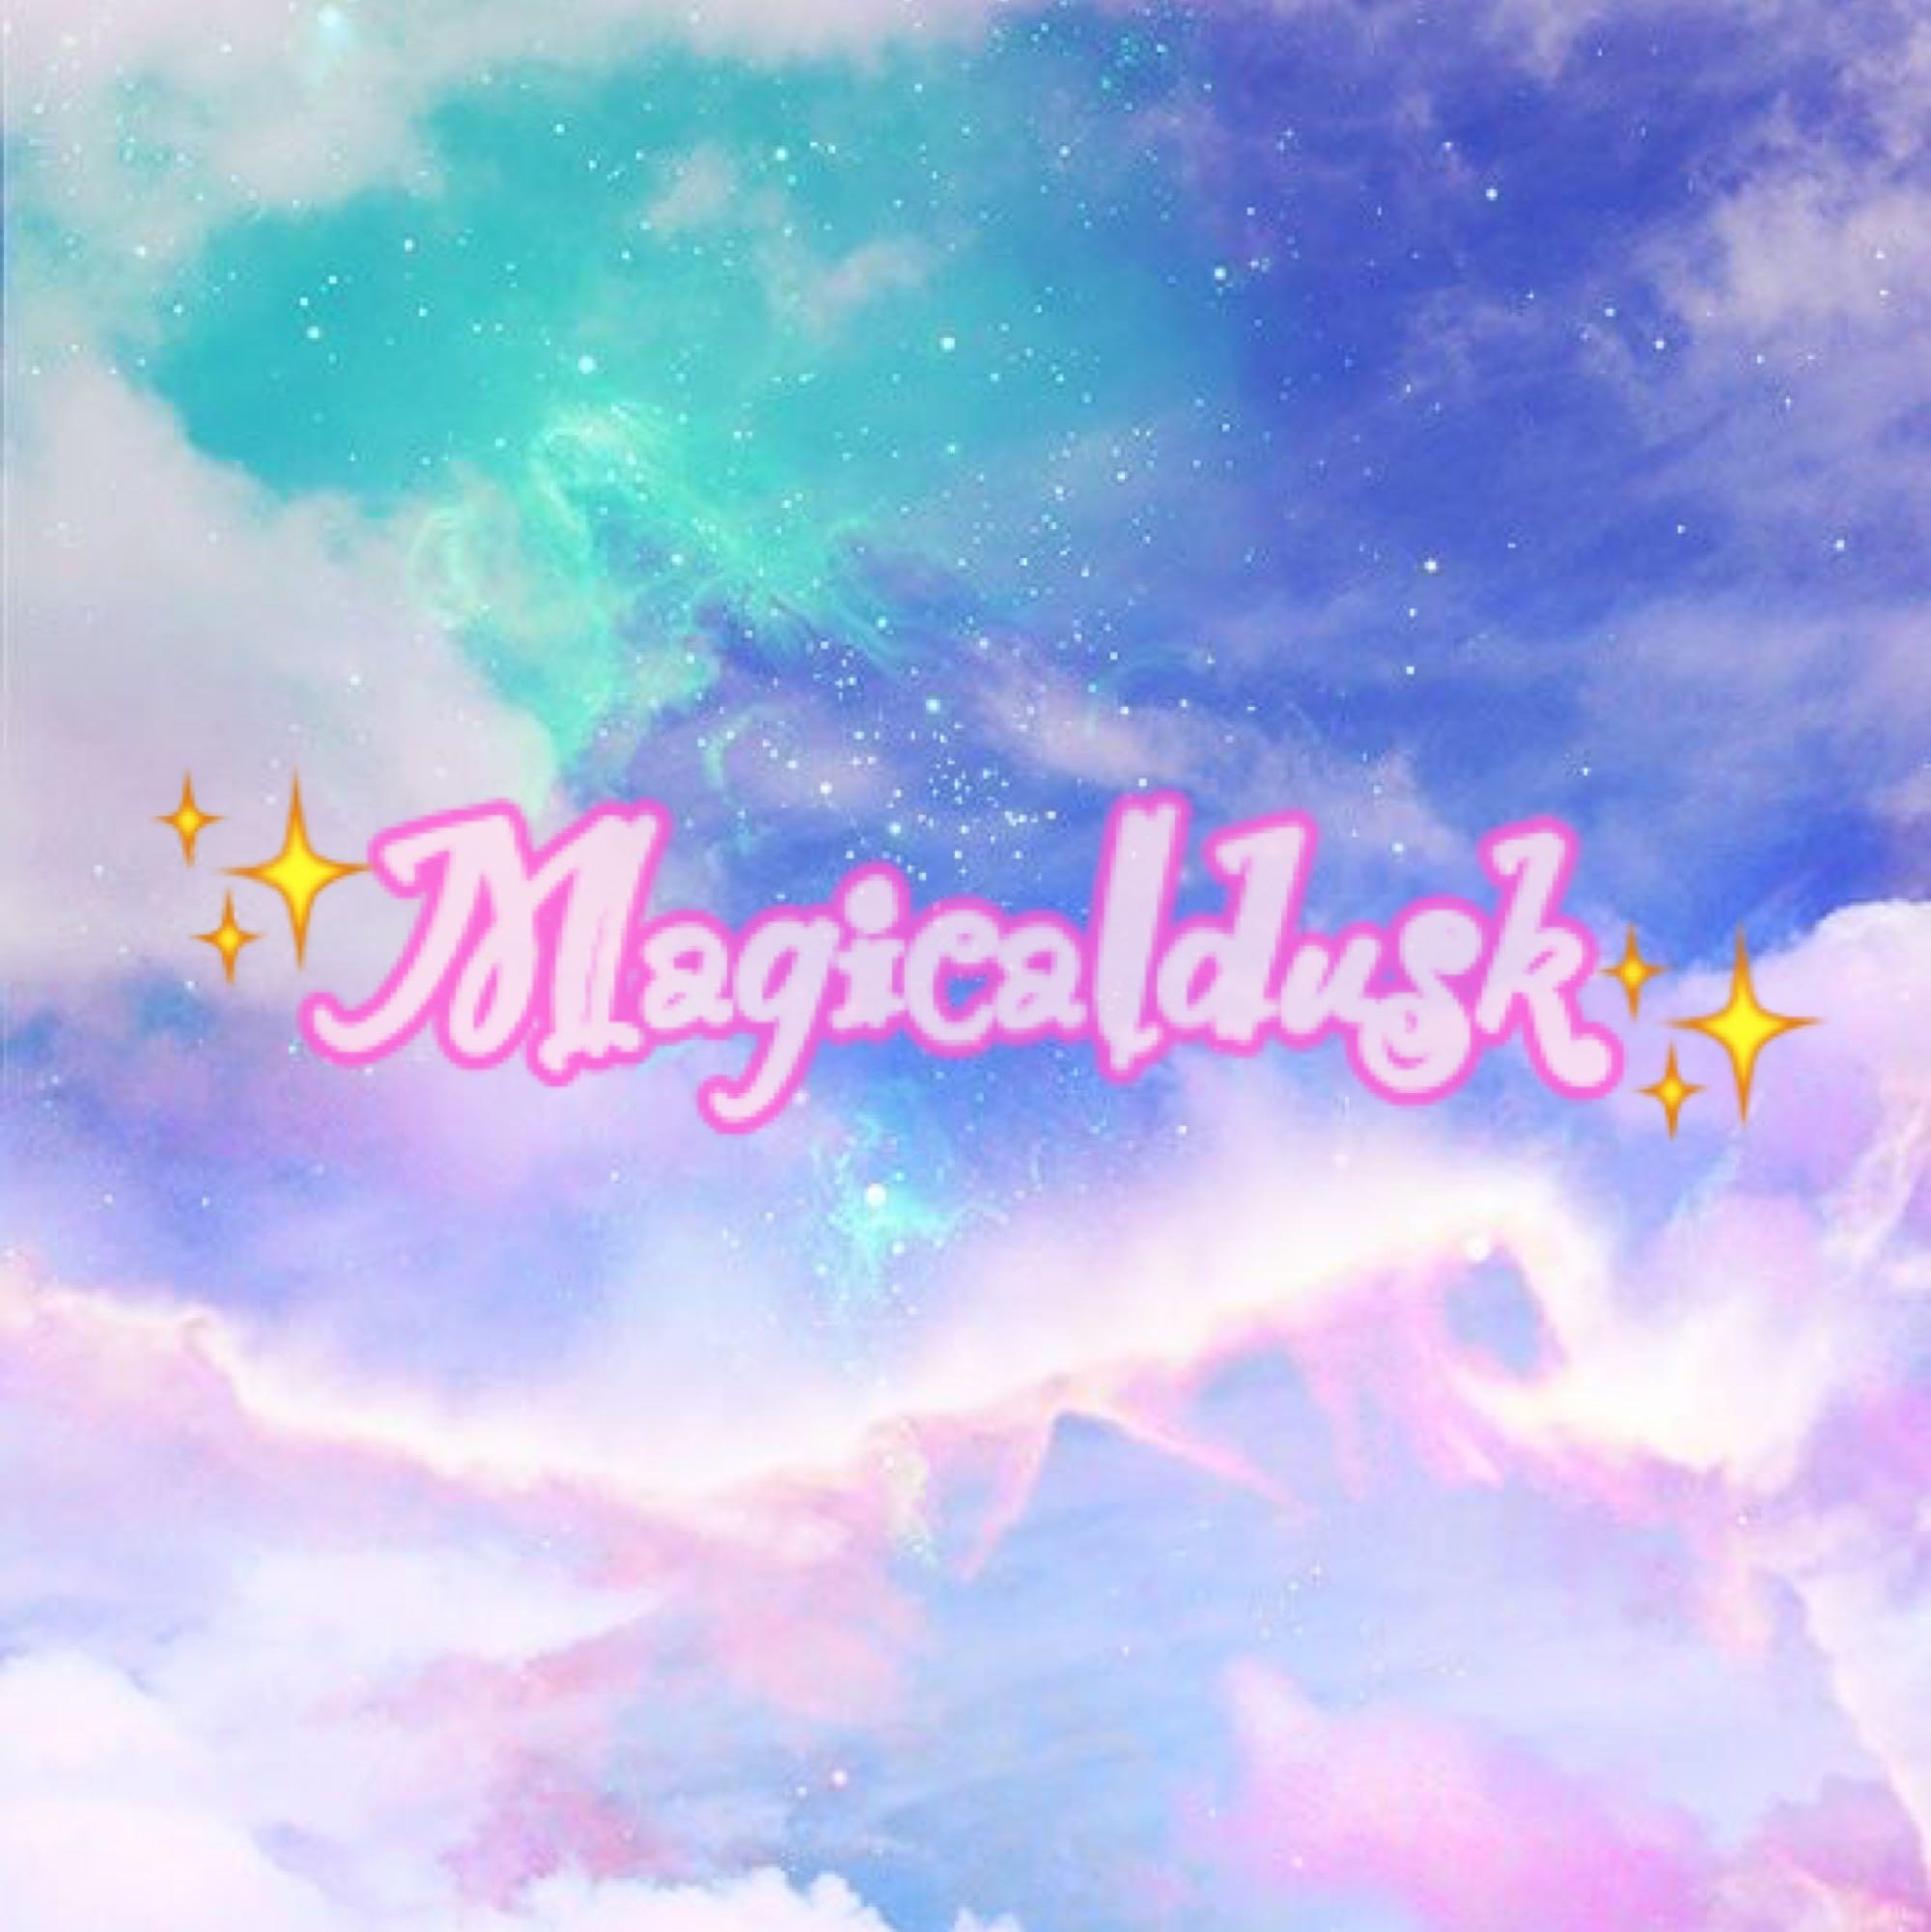 magicaldusk